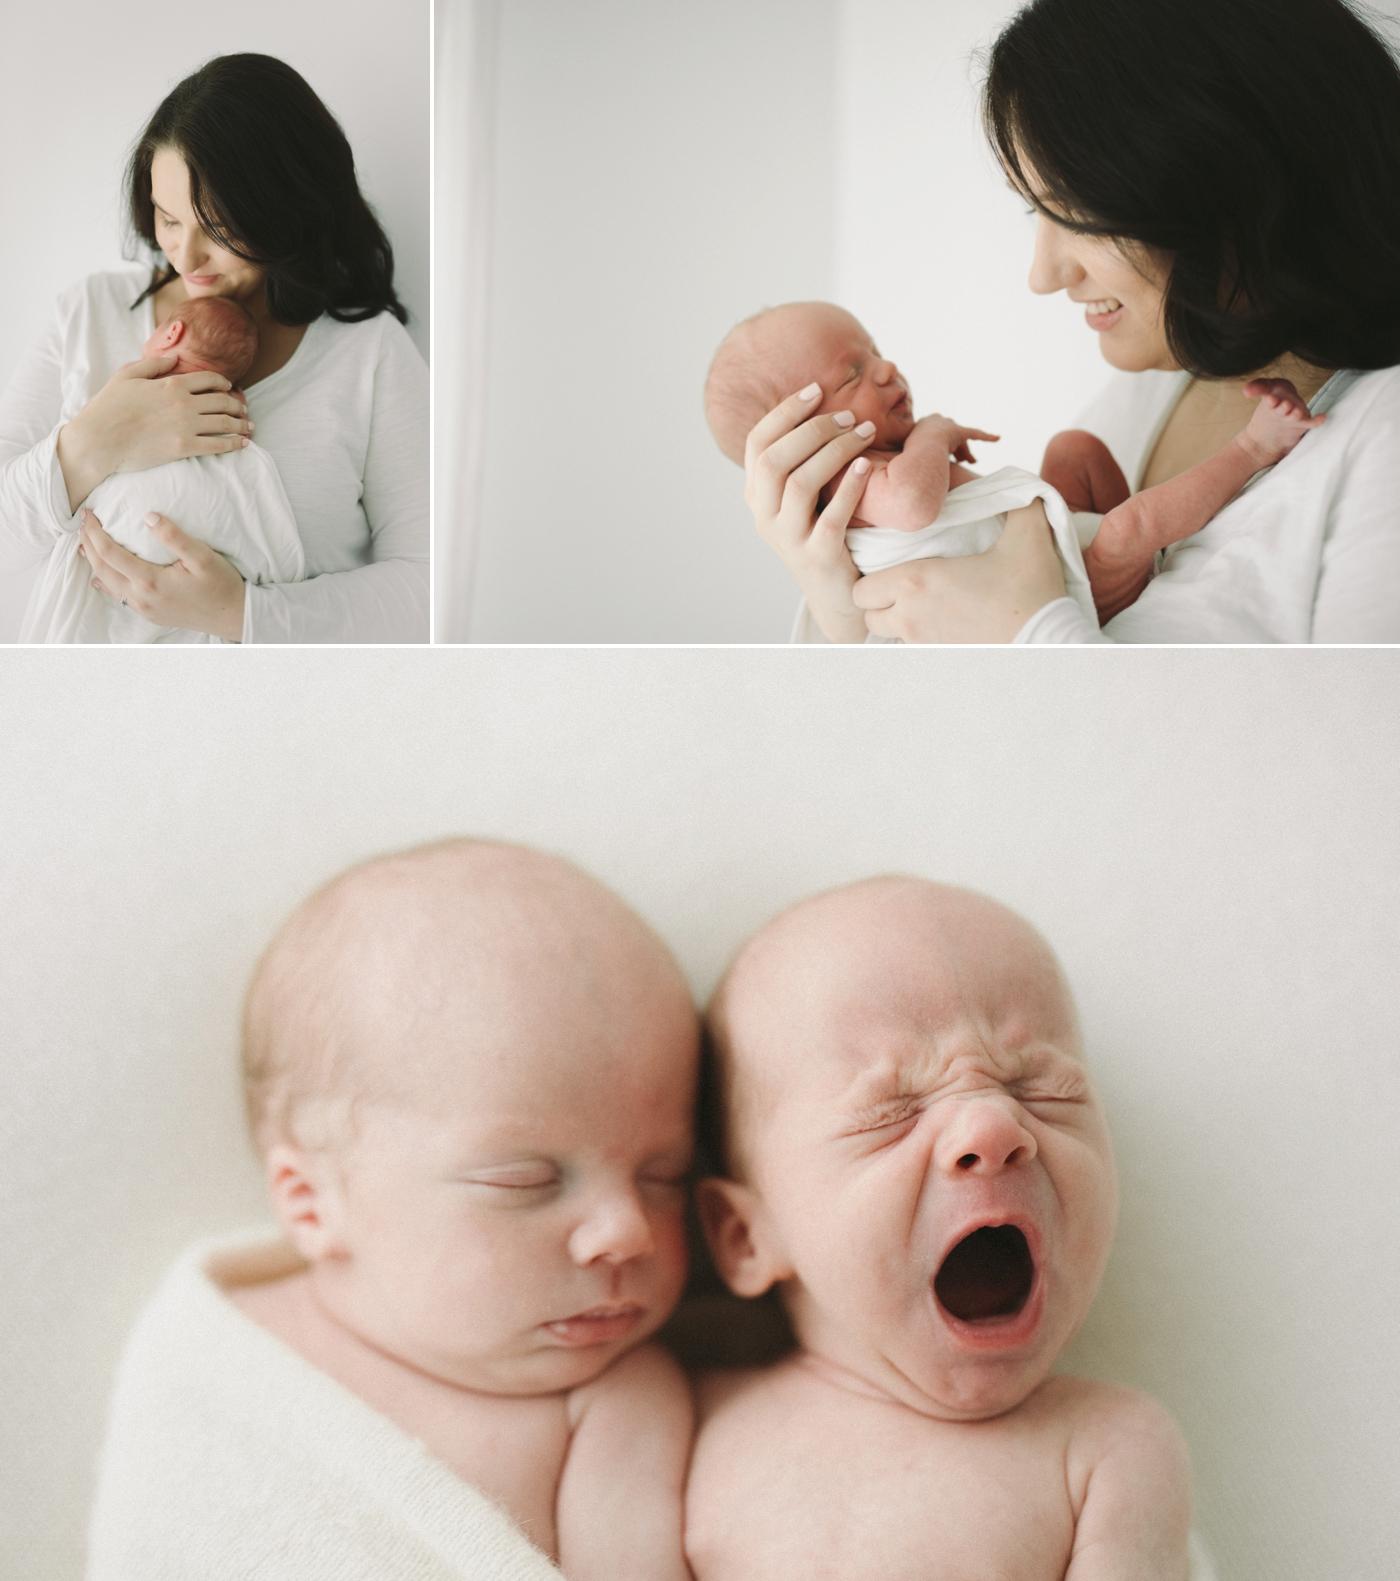 Fred & Otis - Twin Newborn Photographer - Natural Newborn Photographer in Adelaide - Simple, modern & beautiful newborn photography - Katherine Schultz - www.katherineschultzphotography.com_0011.jpg